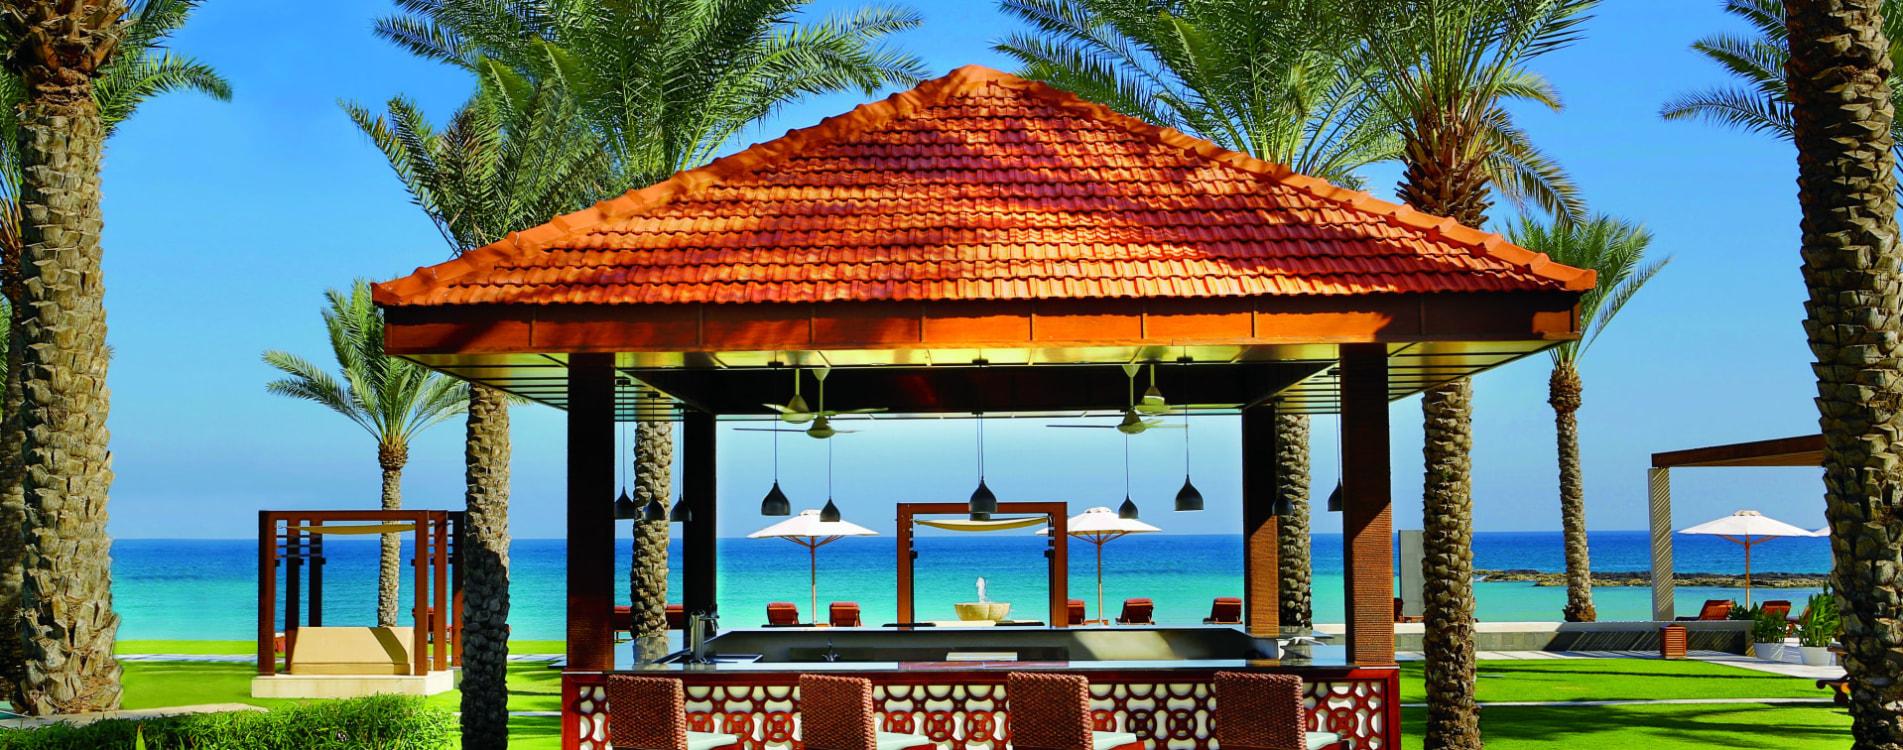 Al-Bustan-Palace-Blue-Bar-Muskat-Oman.jpg